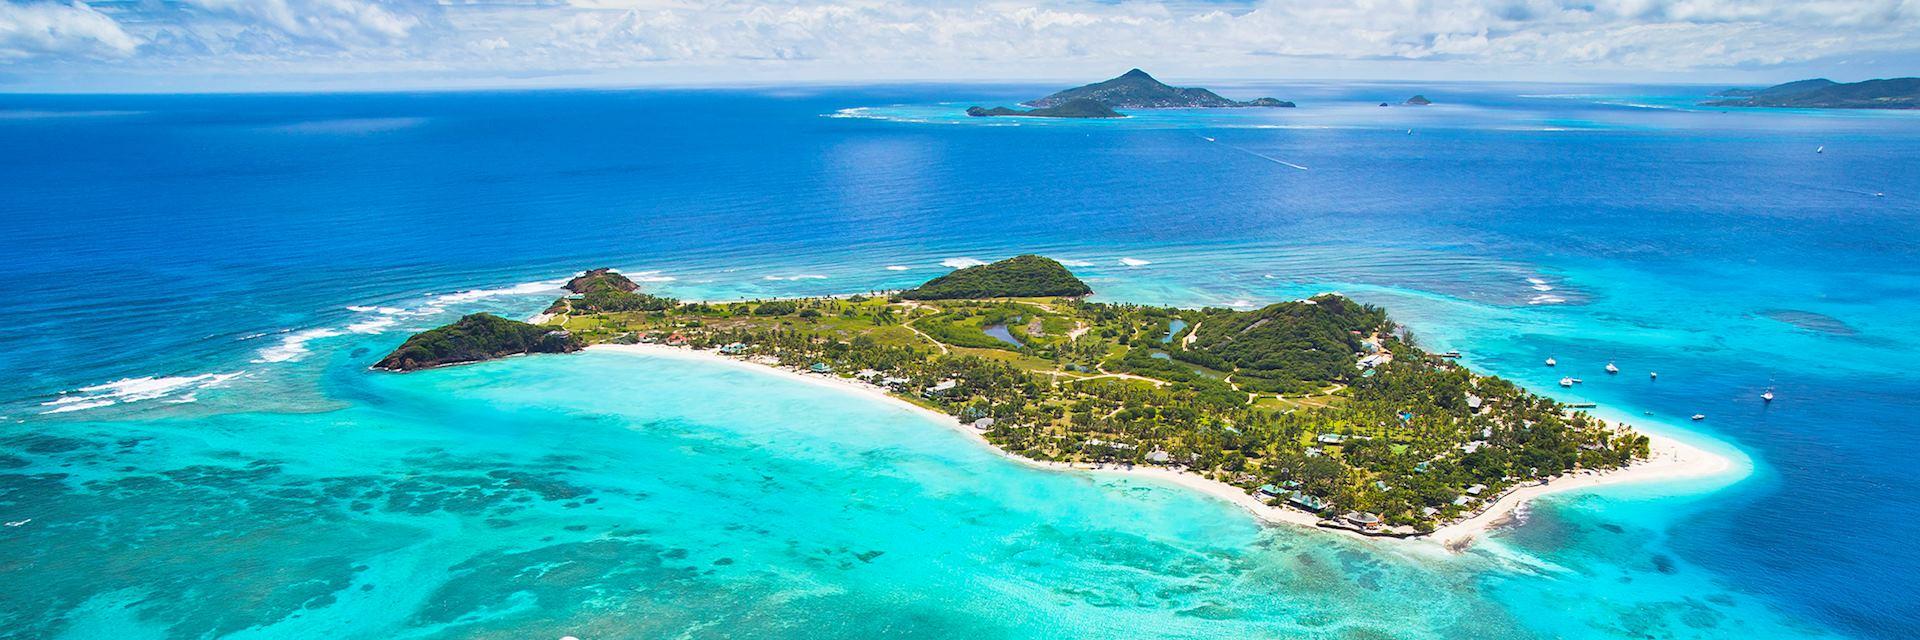 Palm Island Resort, Palm Island, Tobago Cays